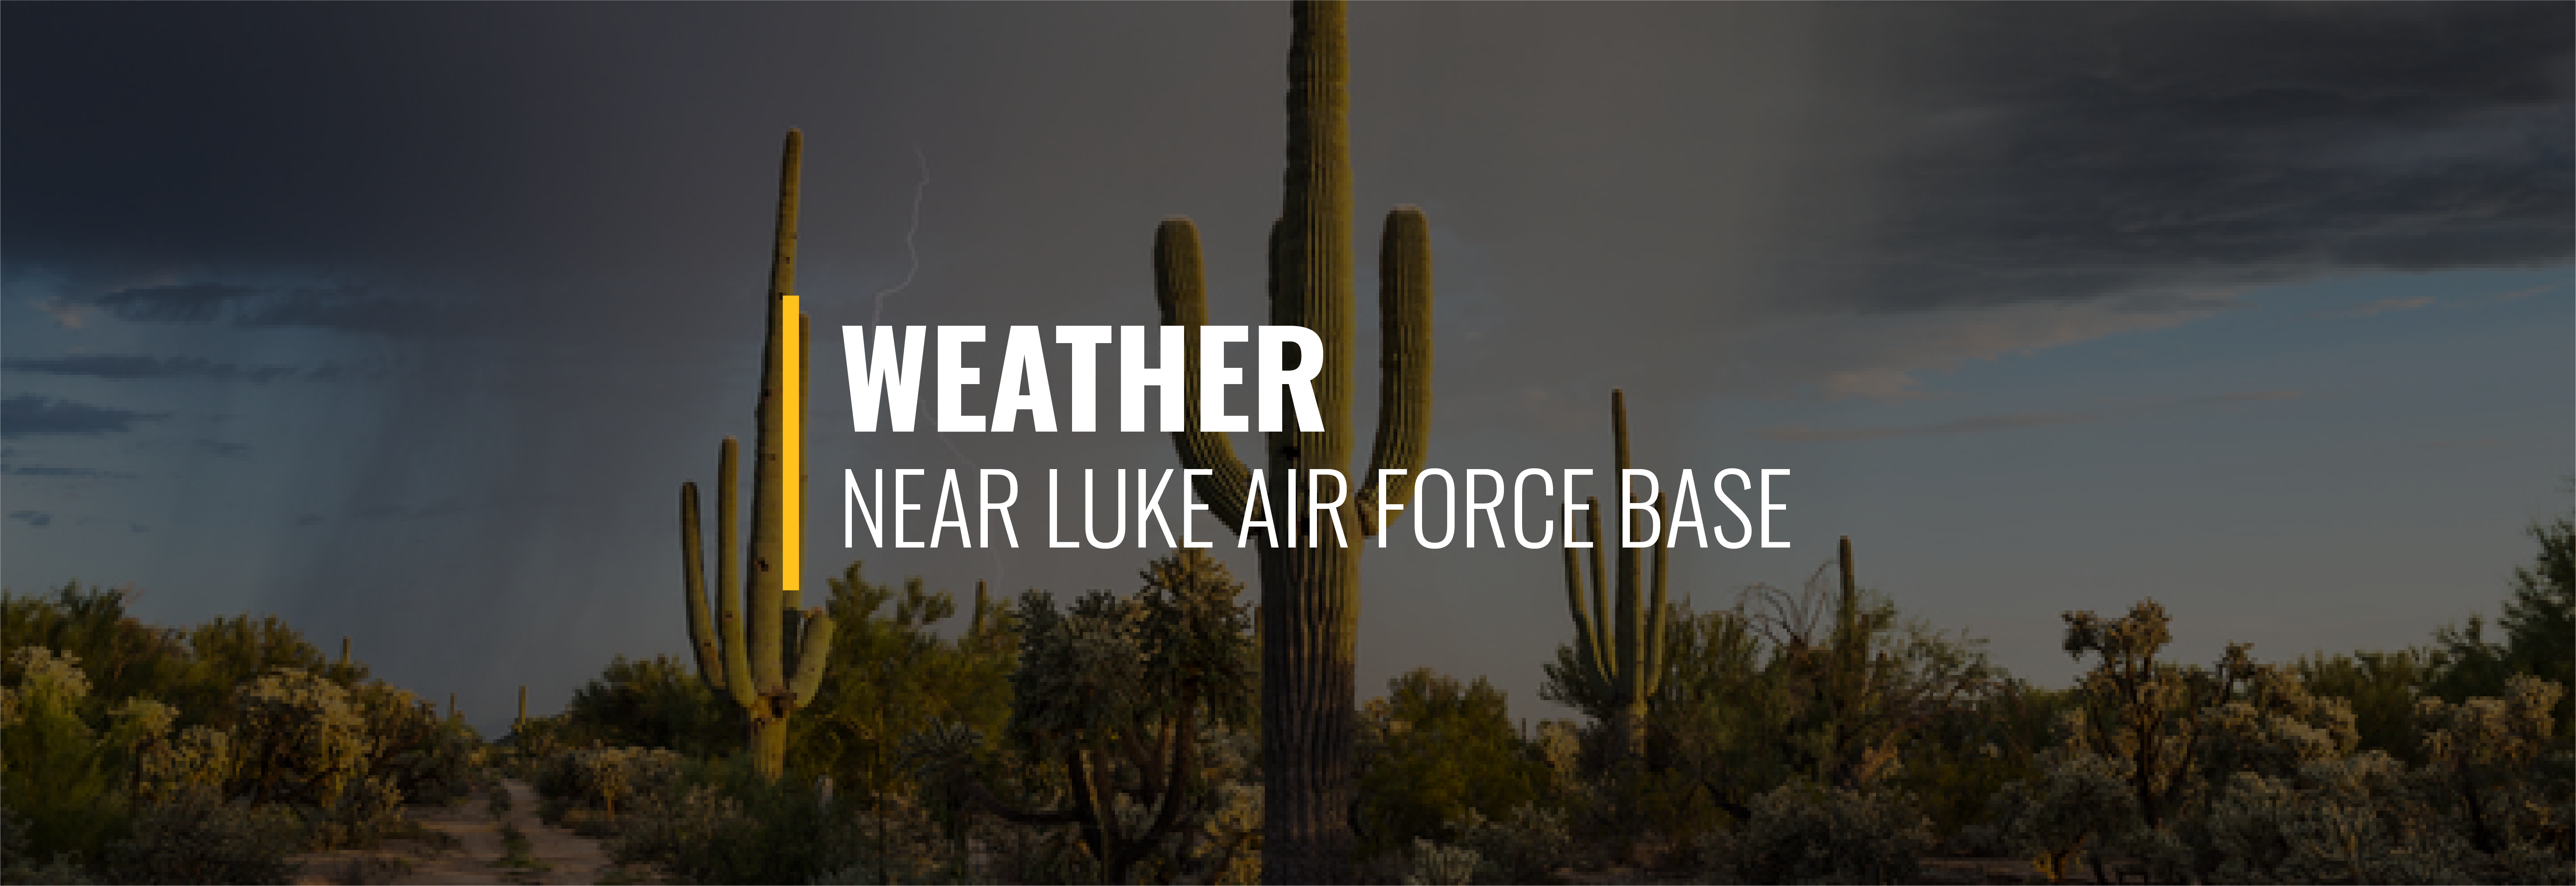 Luke Air Force Base Weather